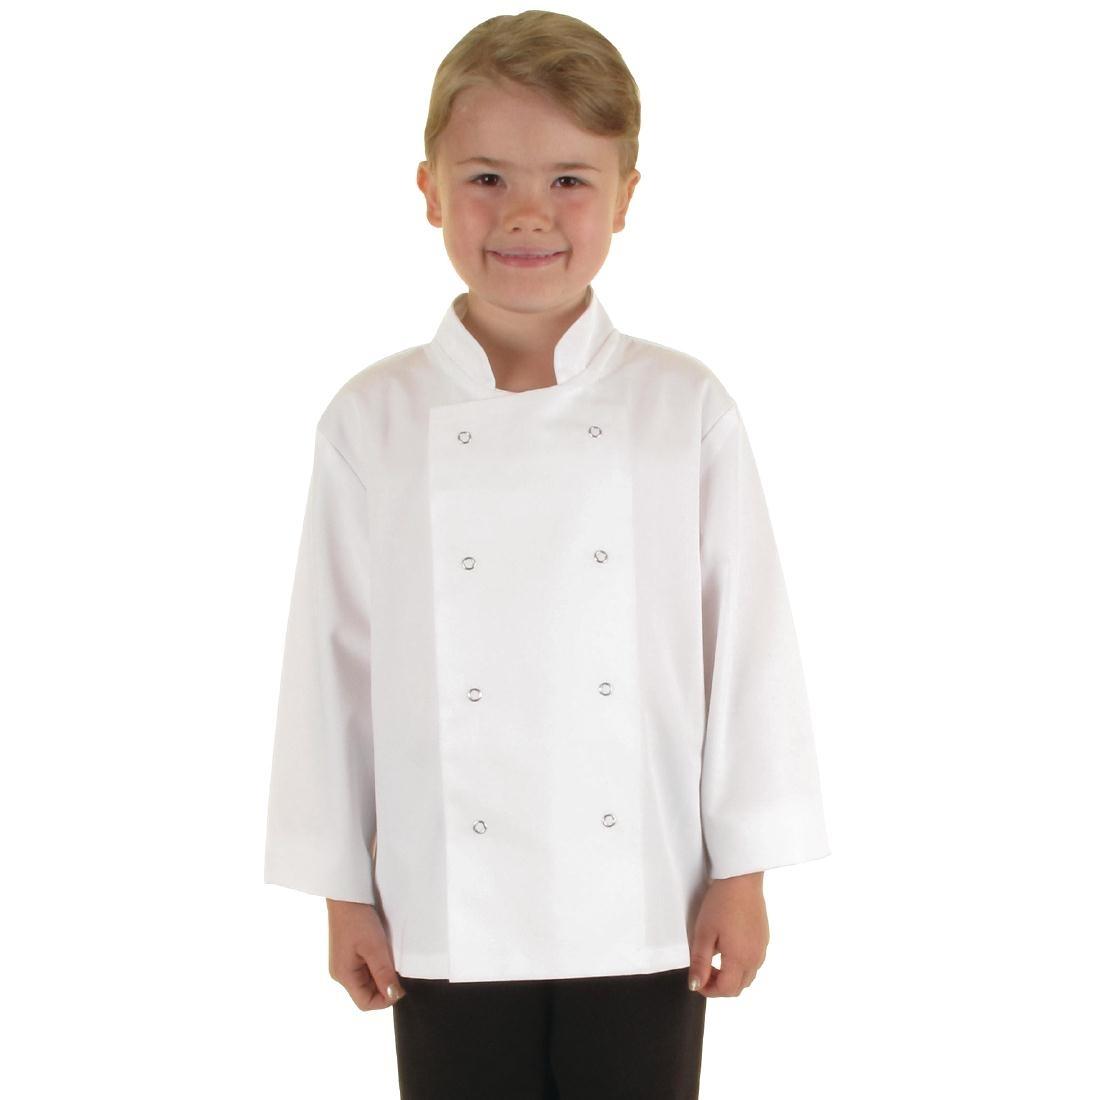 Childrens Chef Clothing